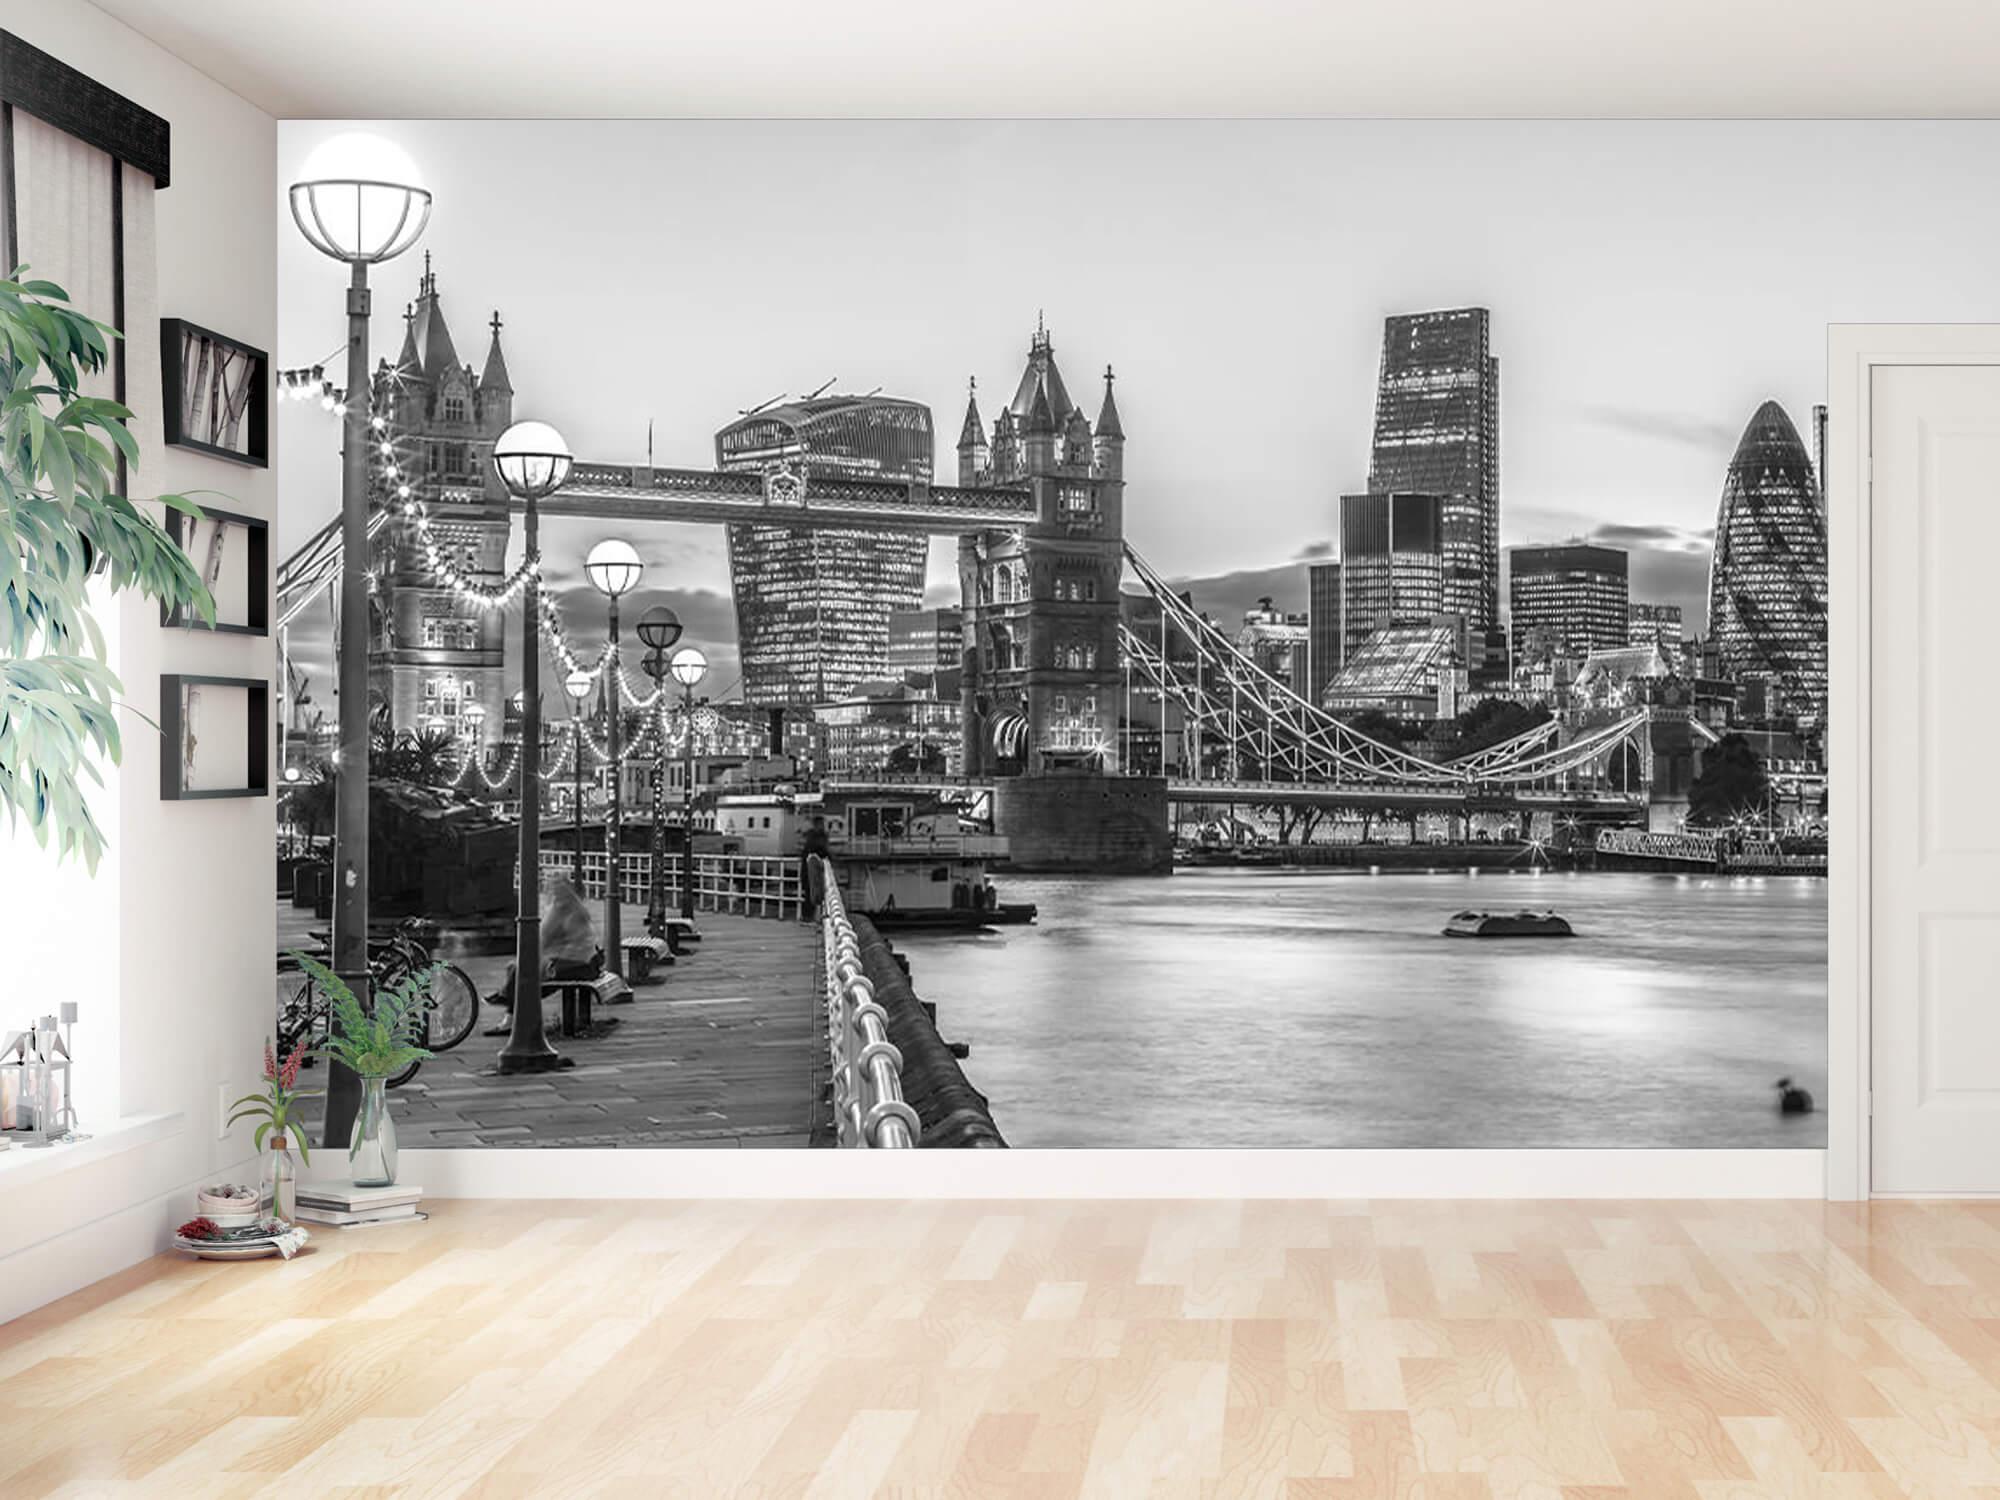 London Riverside Promenade 1